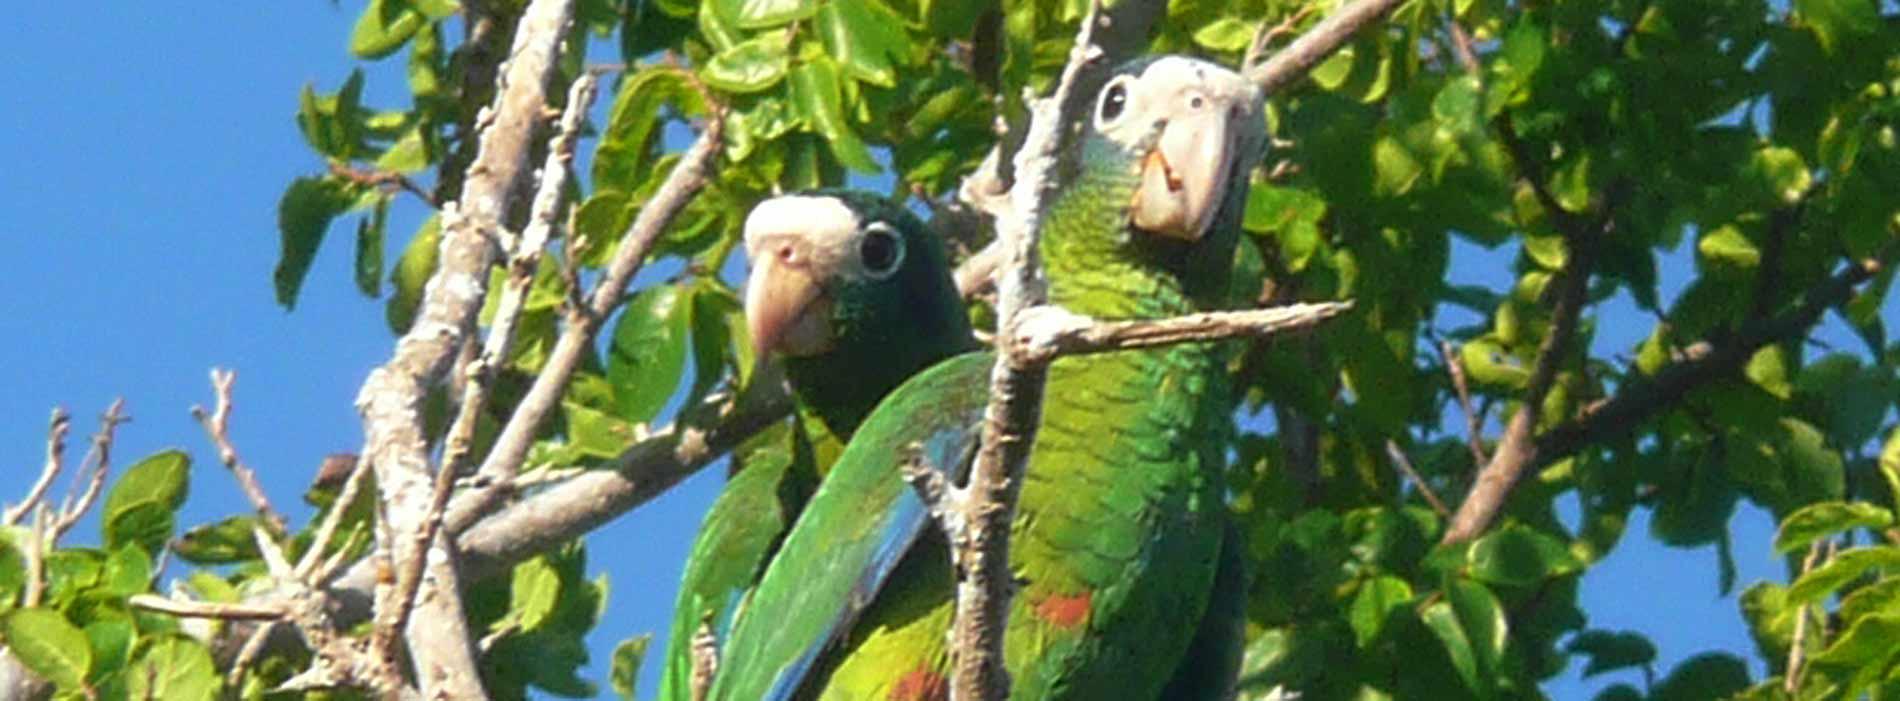 Hispaniolian Amazon parrot